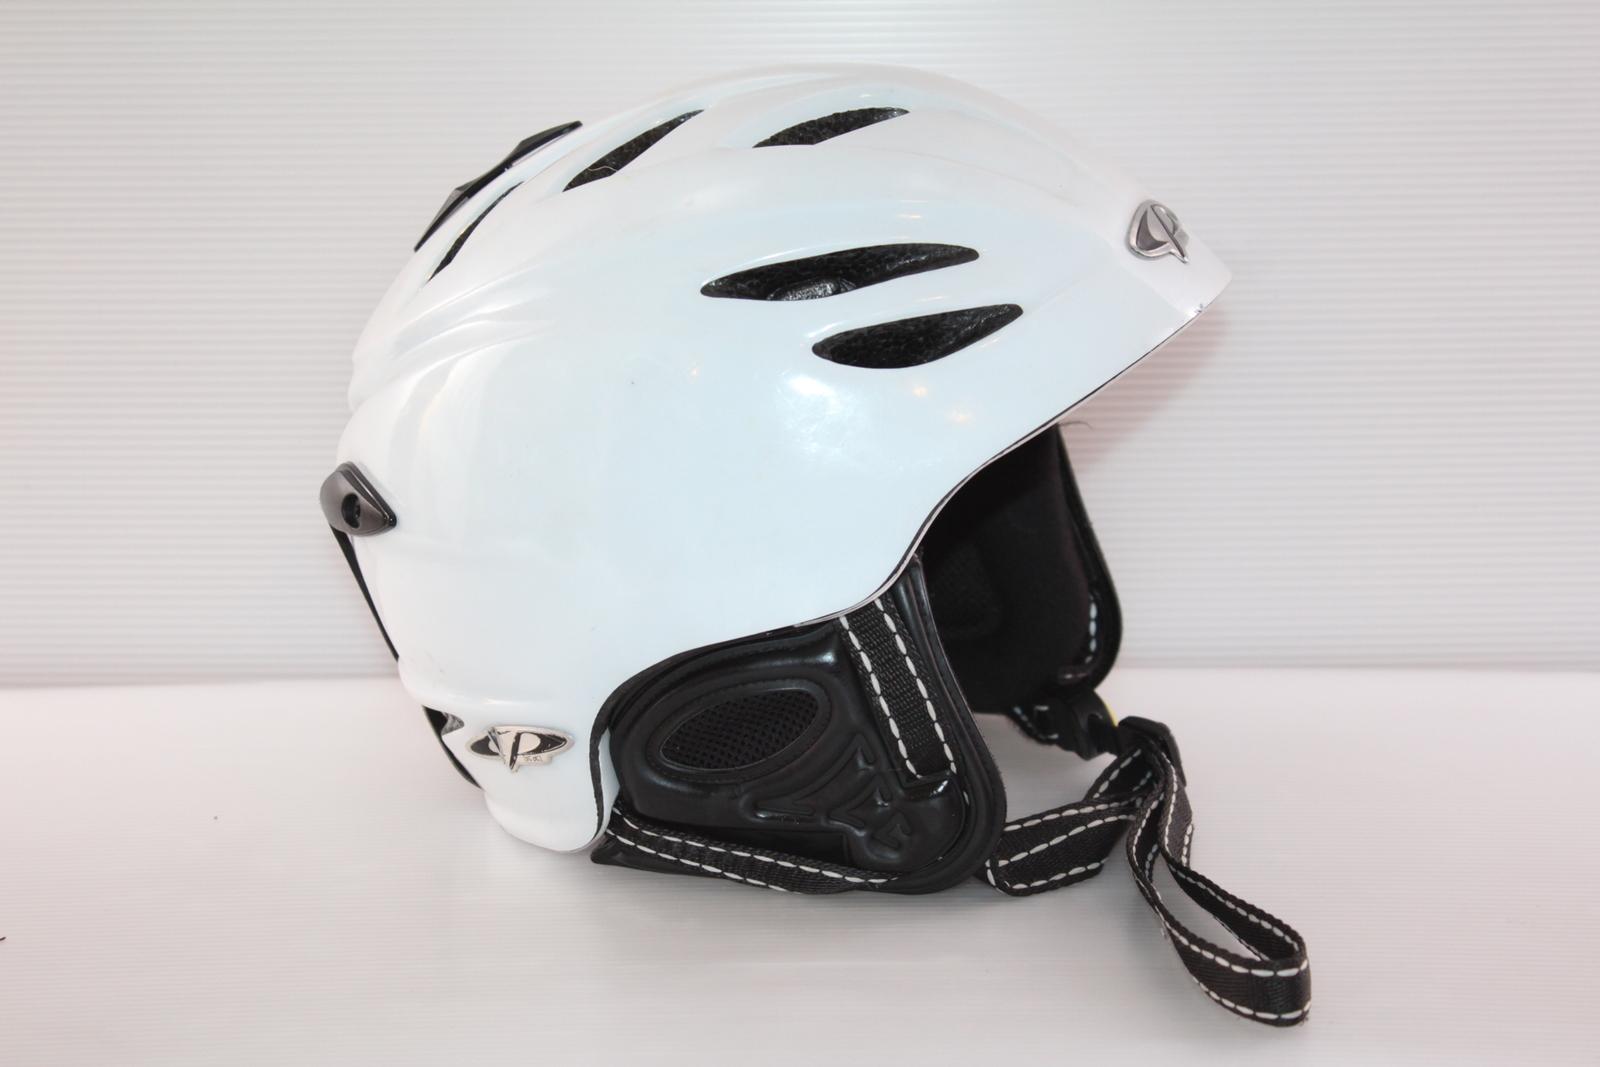 Dámská lyžařská helma CP  - posuvná vel. 53 - 55